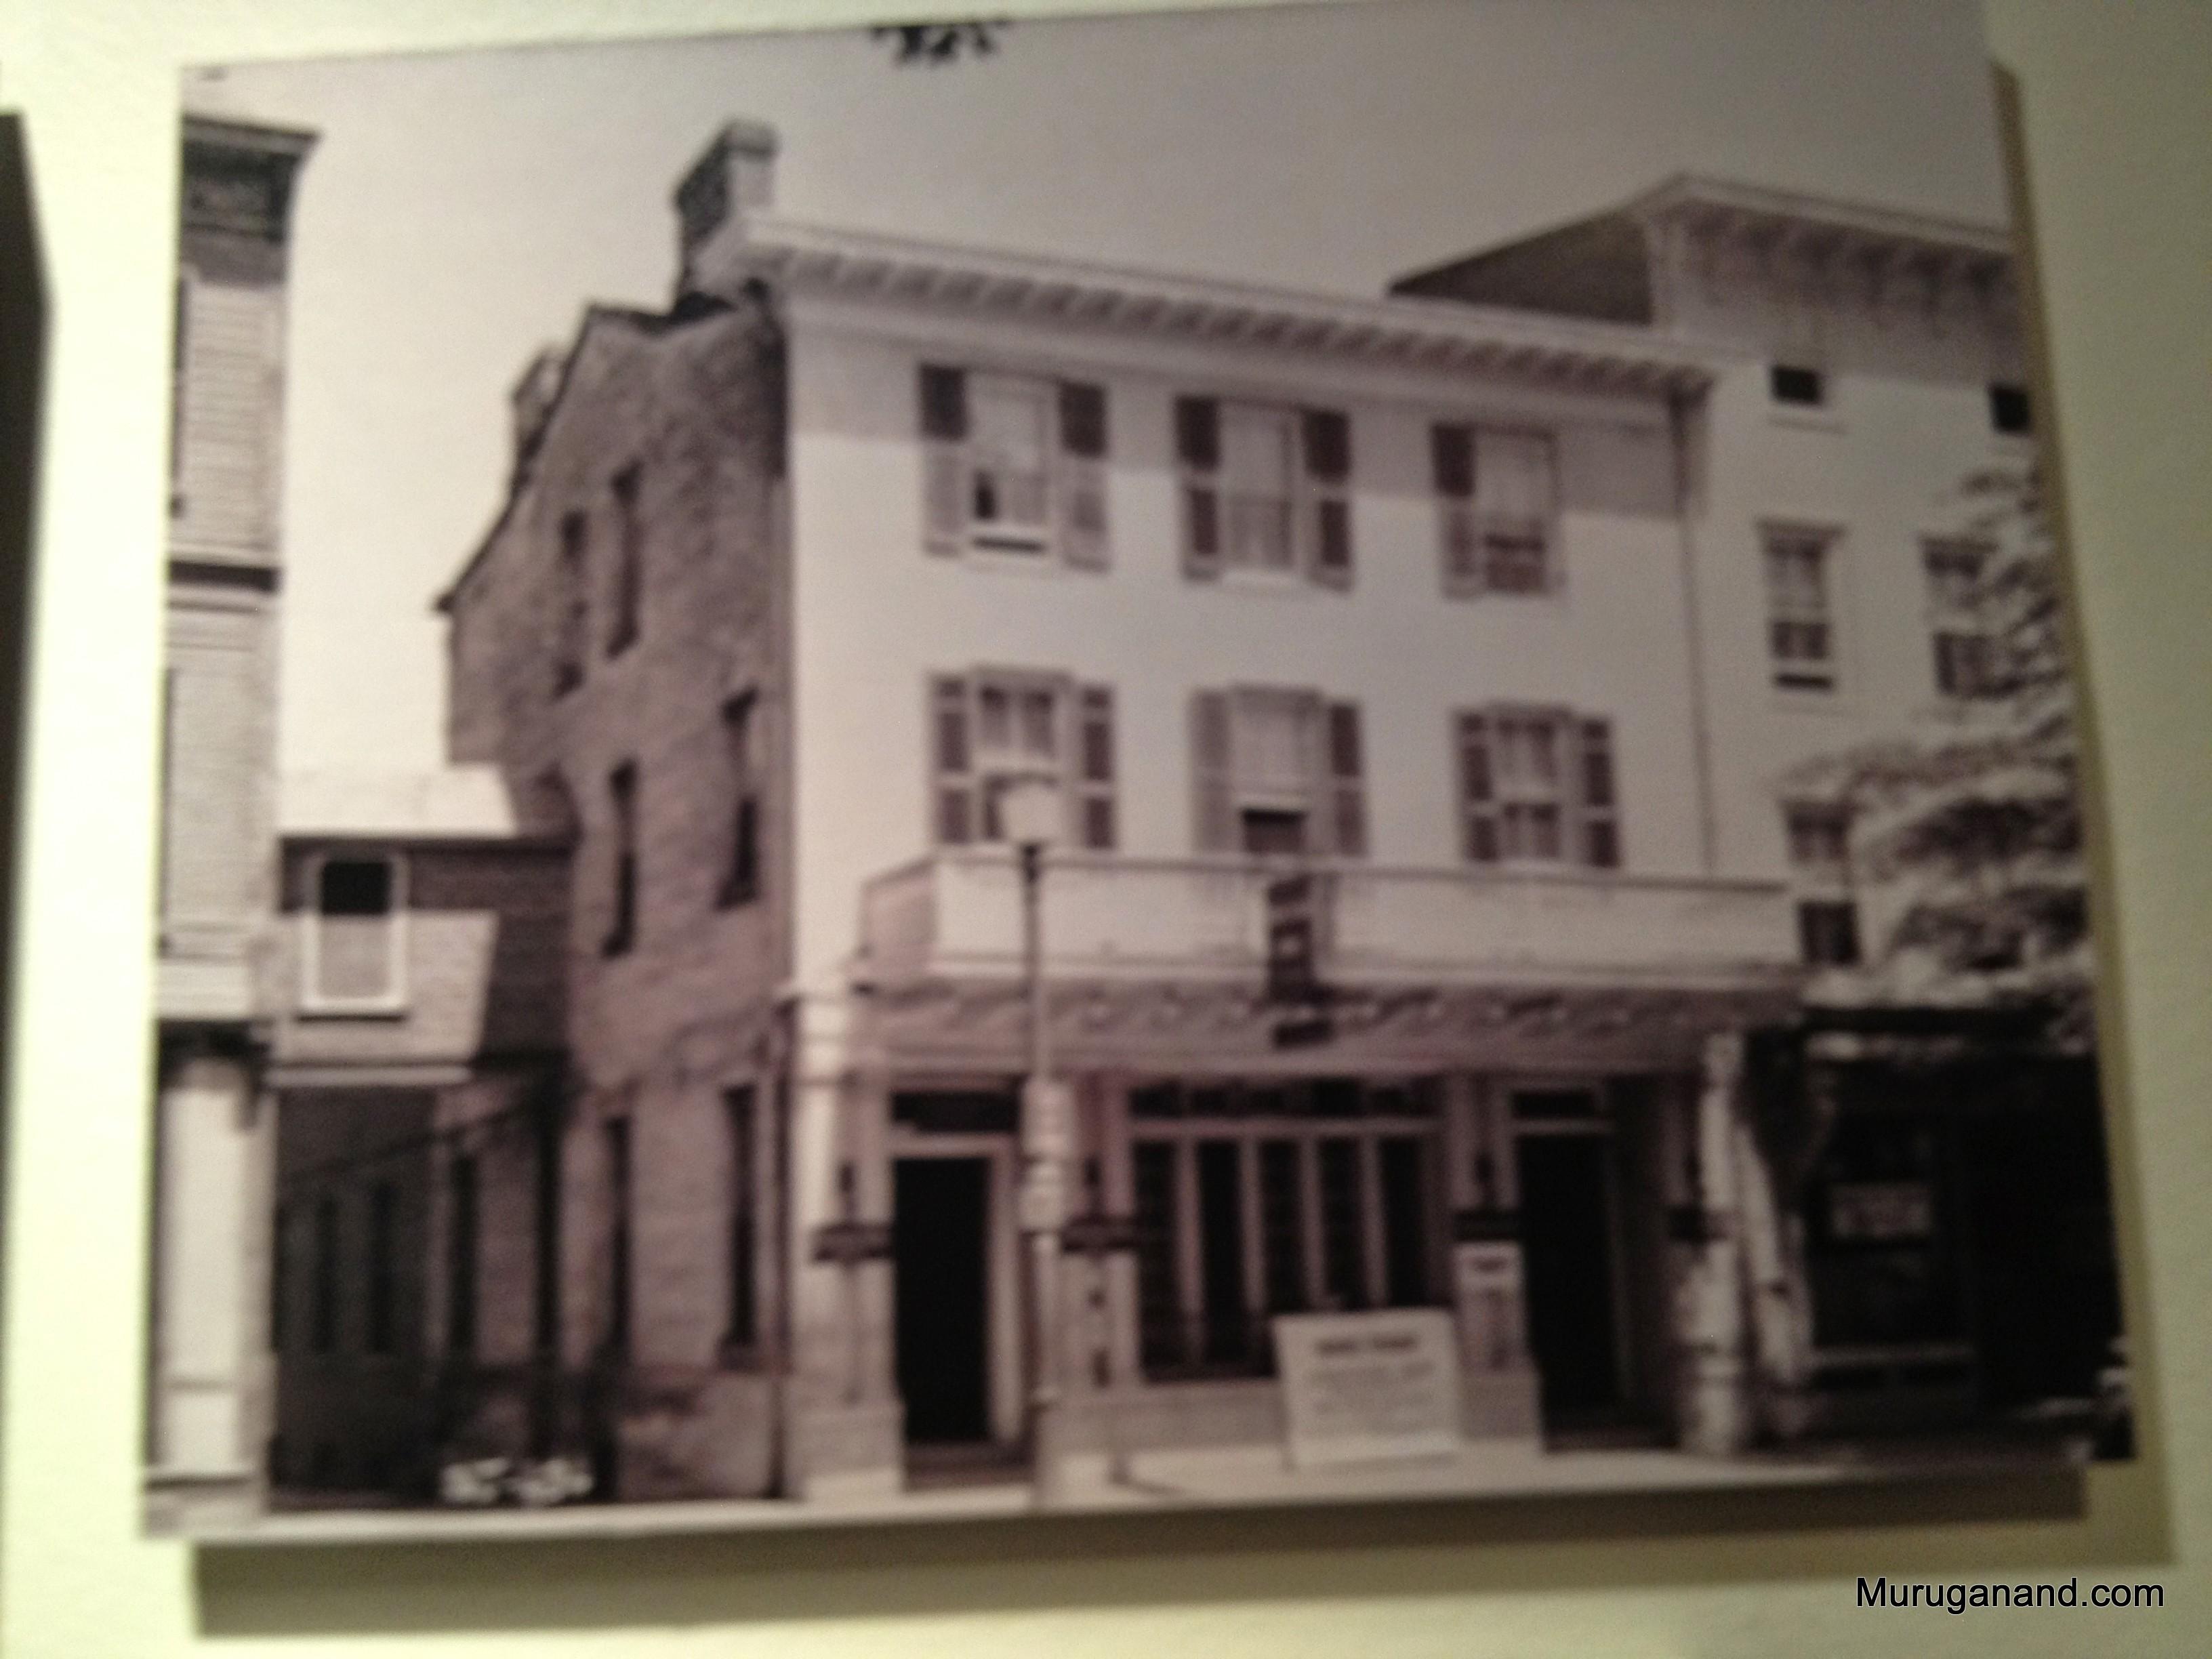 Nassau Inn, Princeton; practiced racial segregation